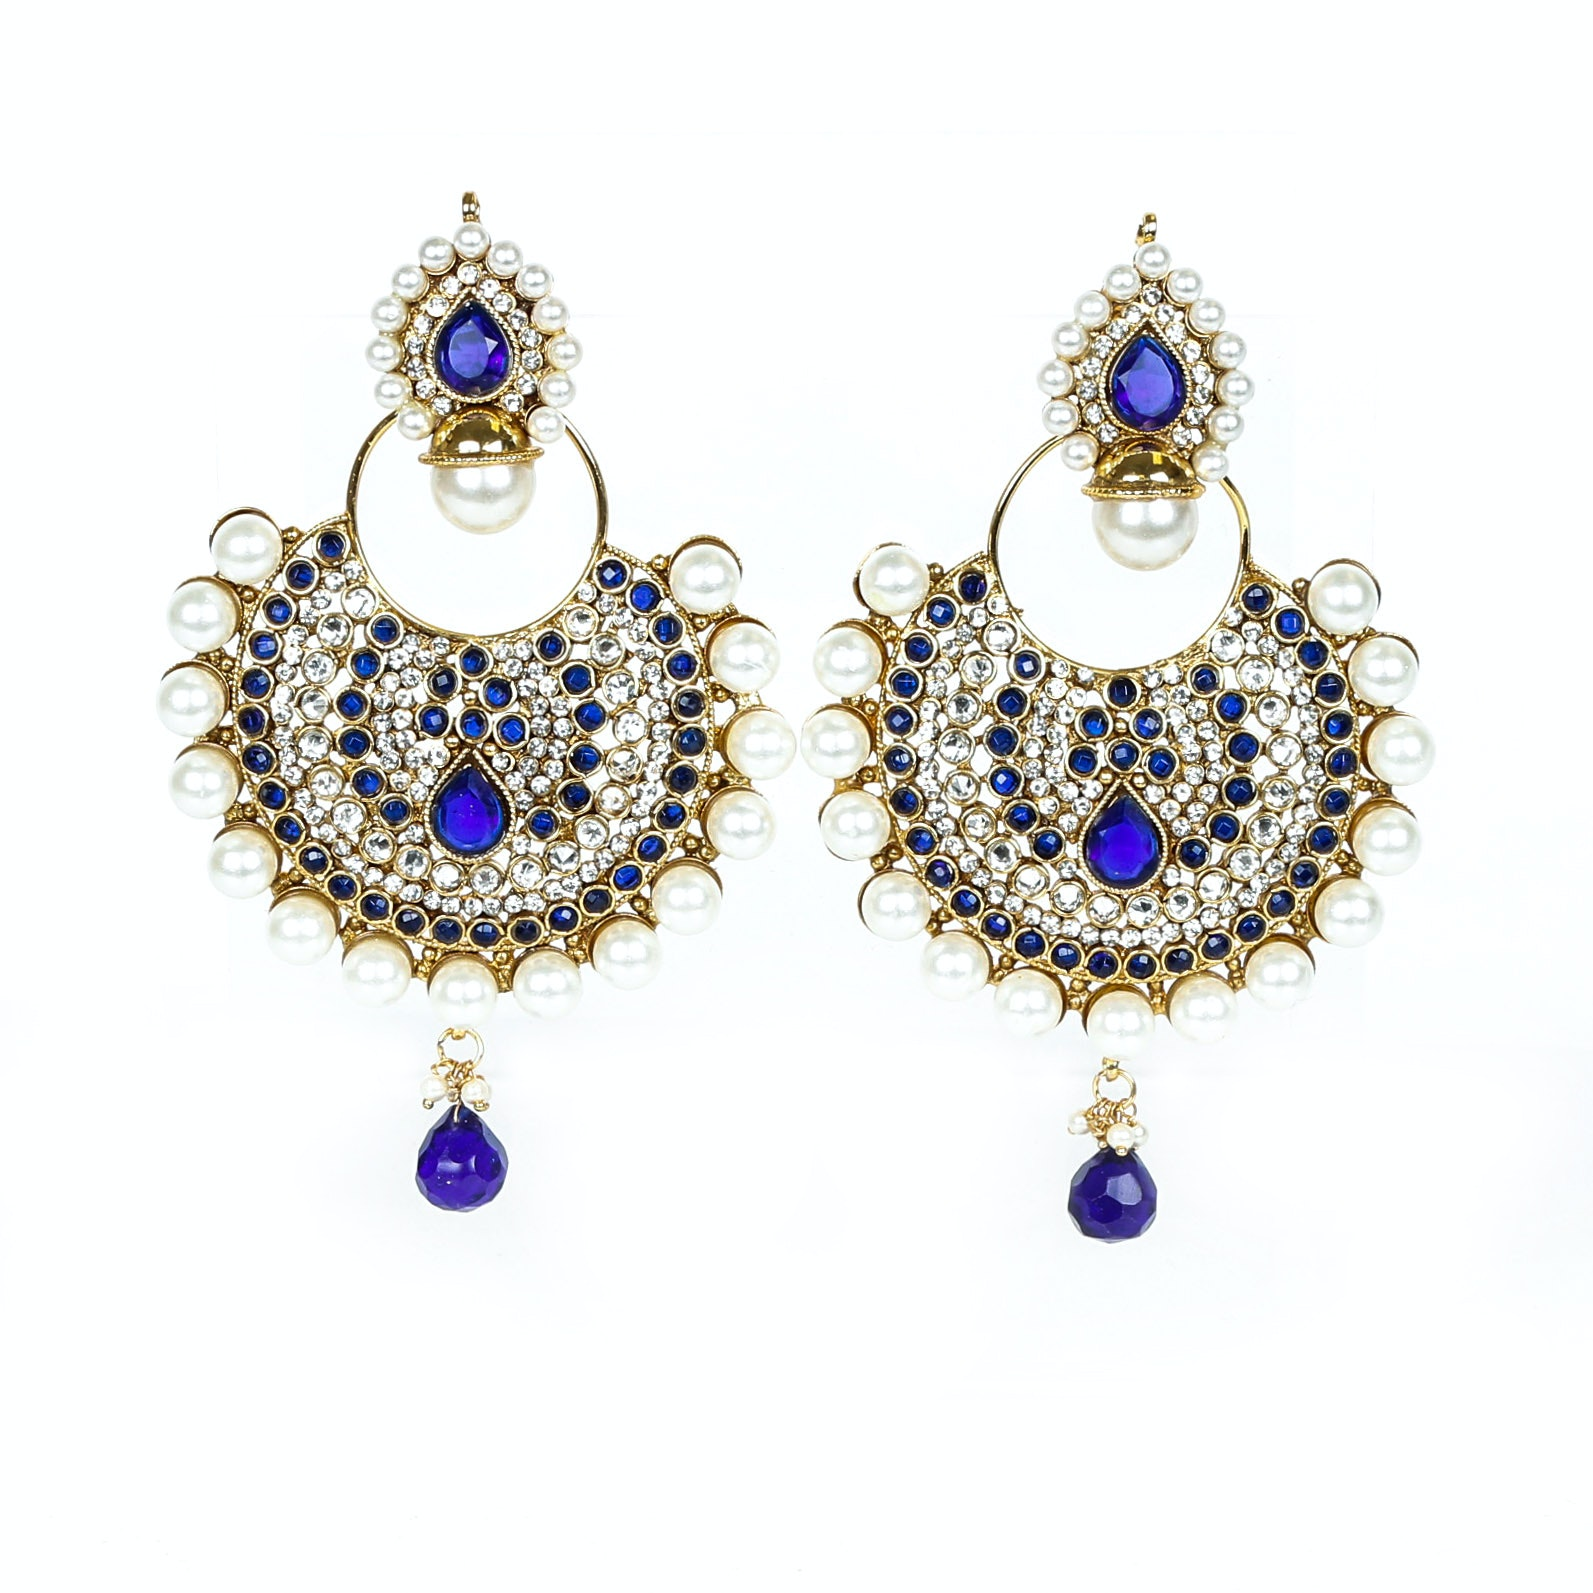 Indian Style Costume Chandelier Earrings